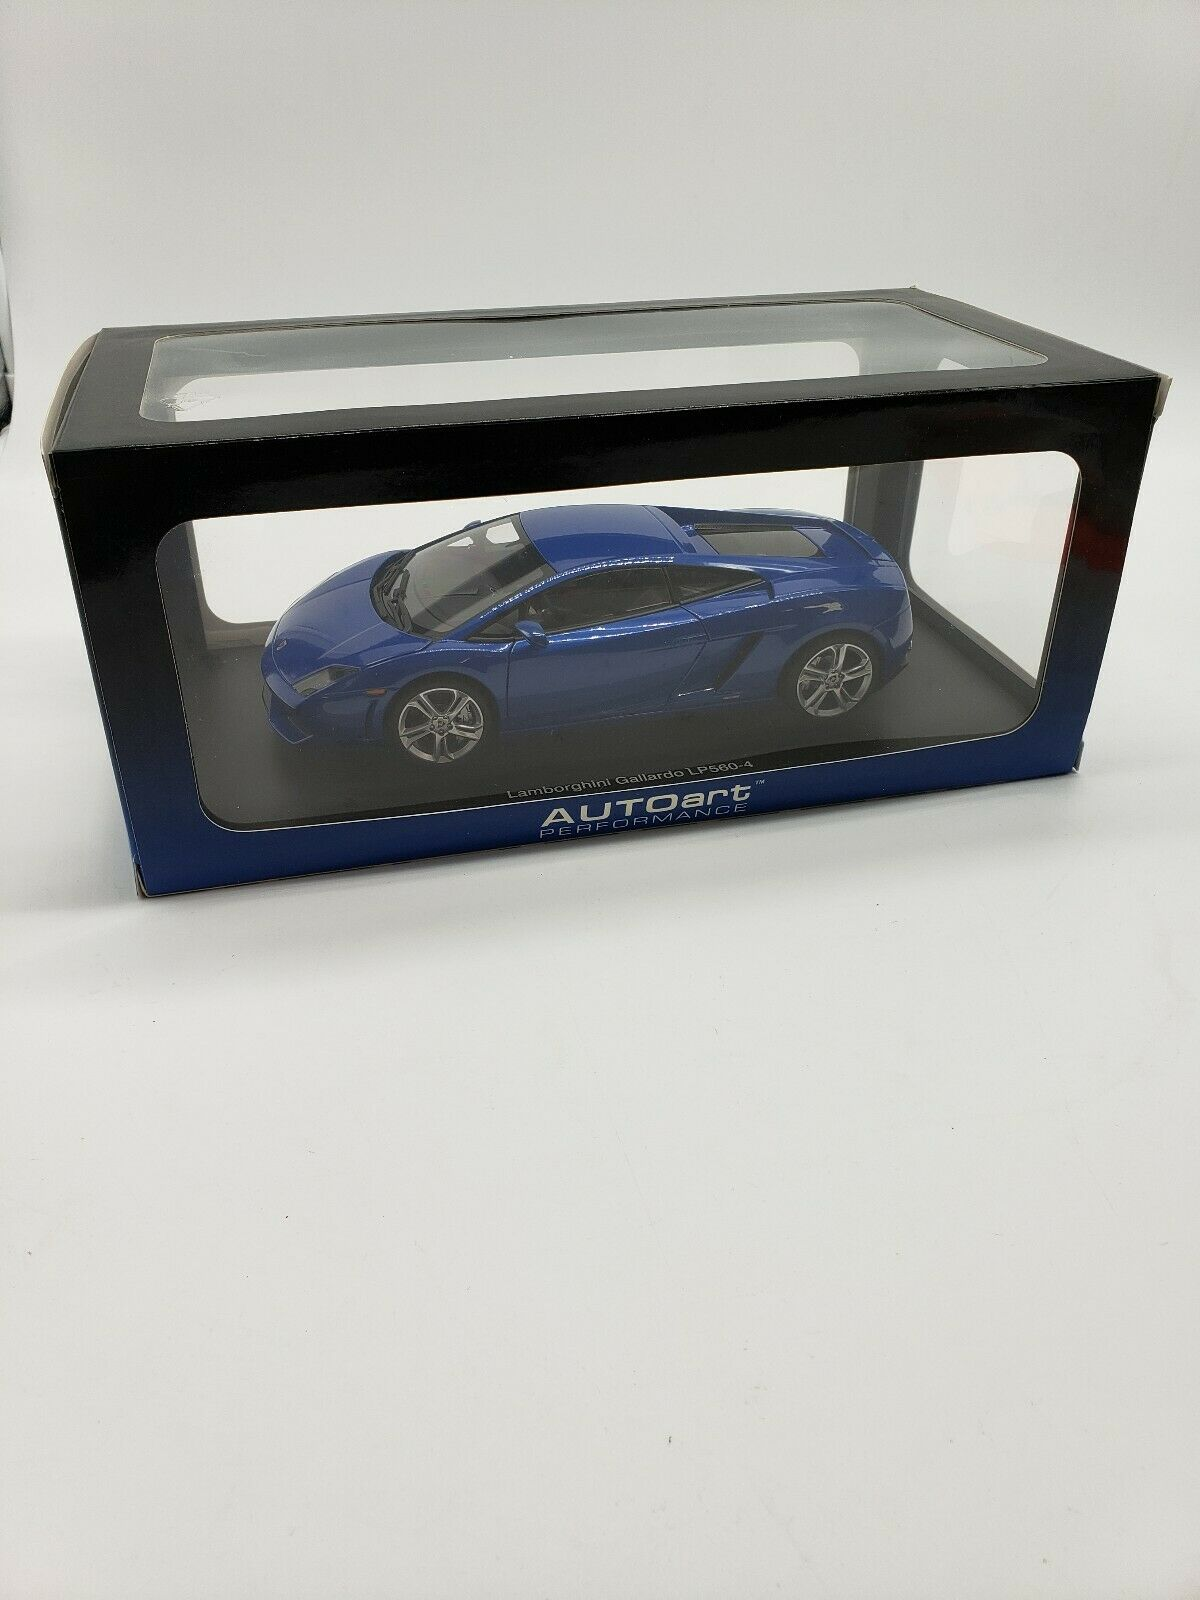 Carart Performance 1 18 74588 Lamborghini Gallardo Lp560-4 Monterey Blau L1